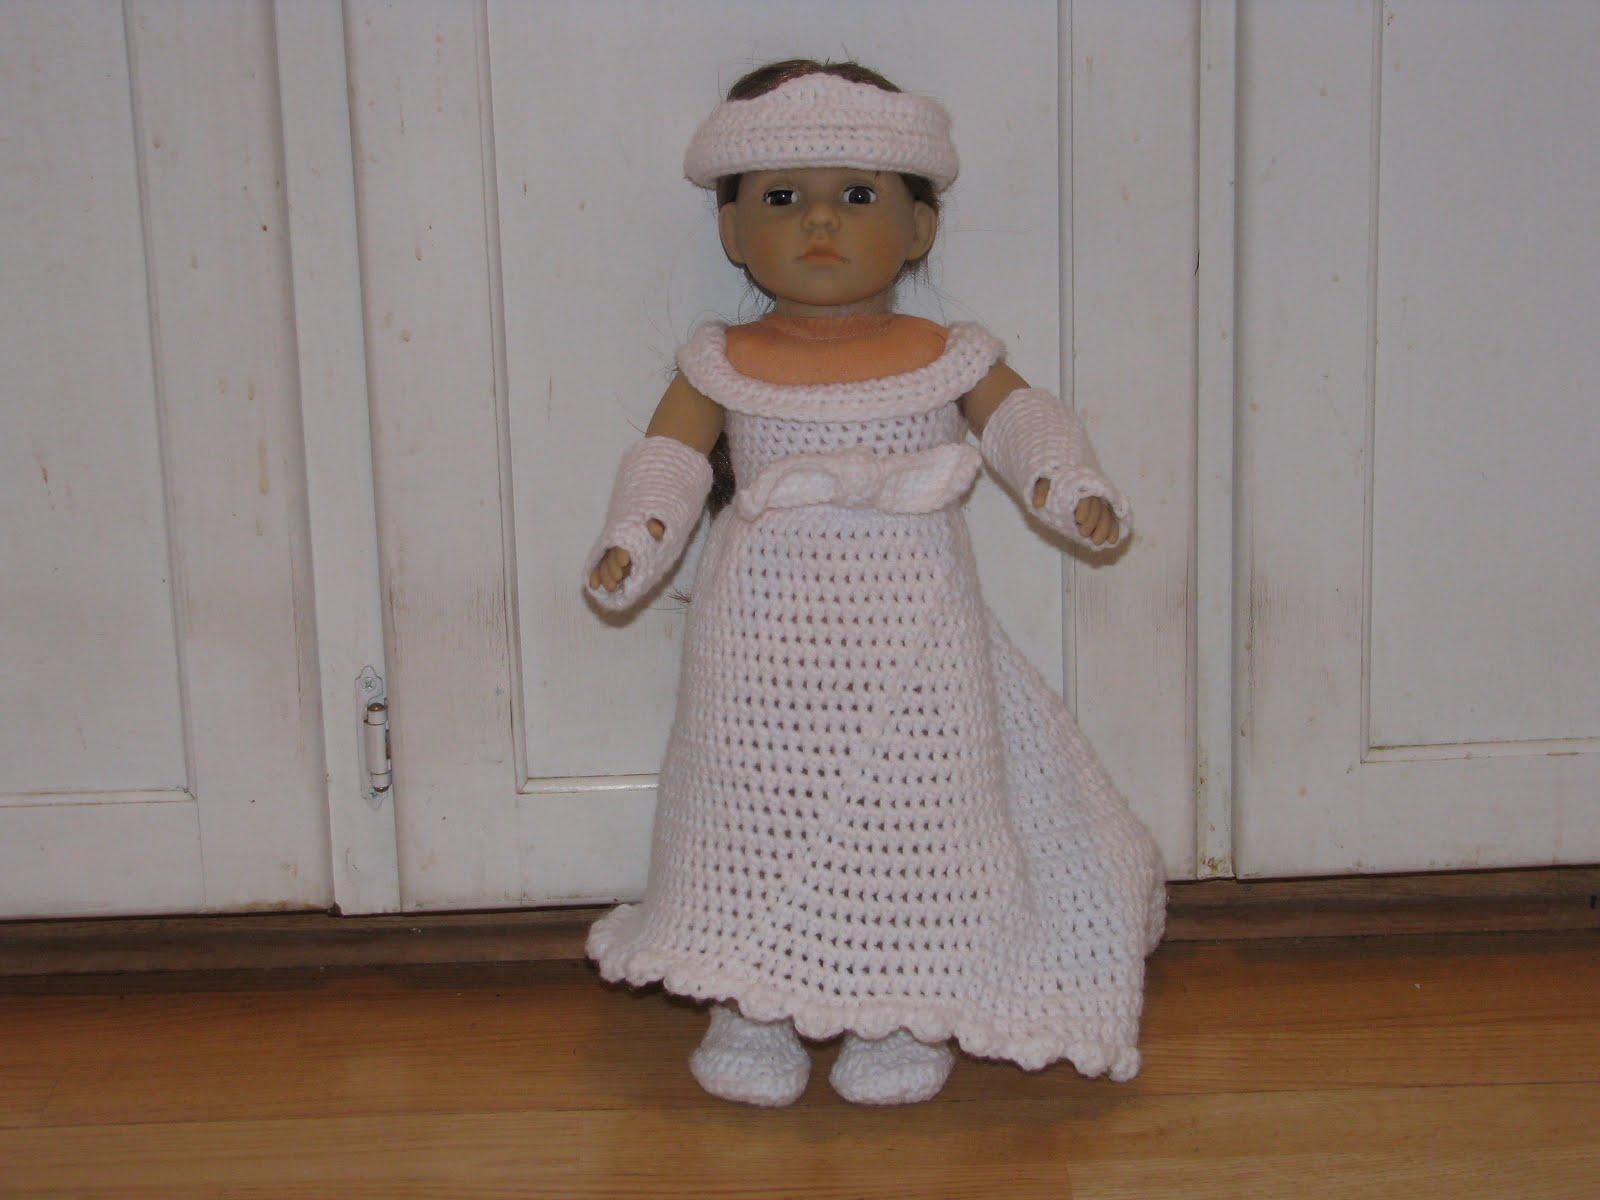 Dress Patterns For American Girl Dolls American Girl Doll Wedding